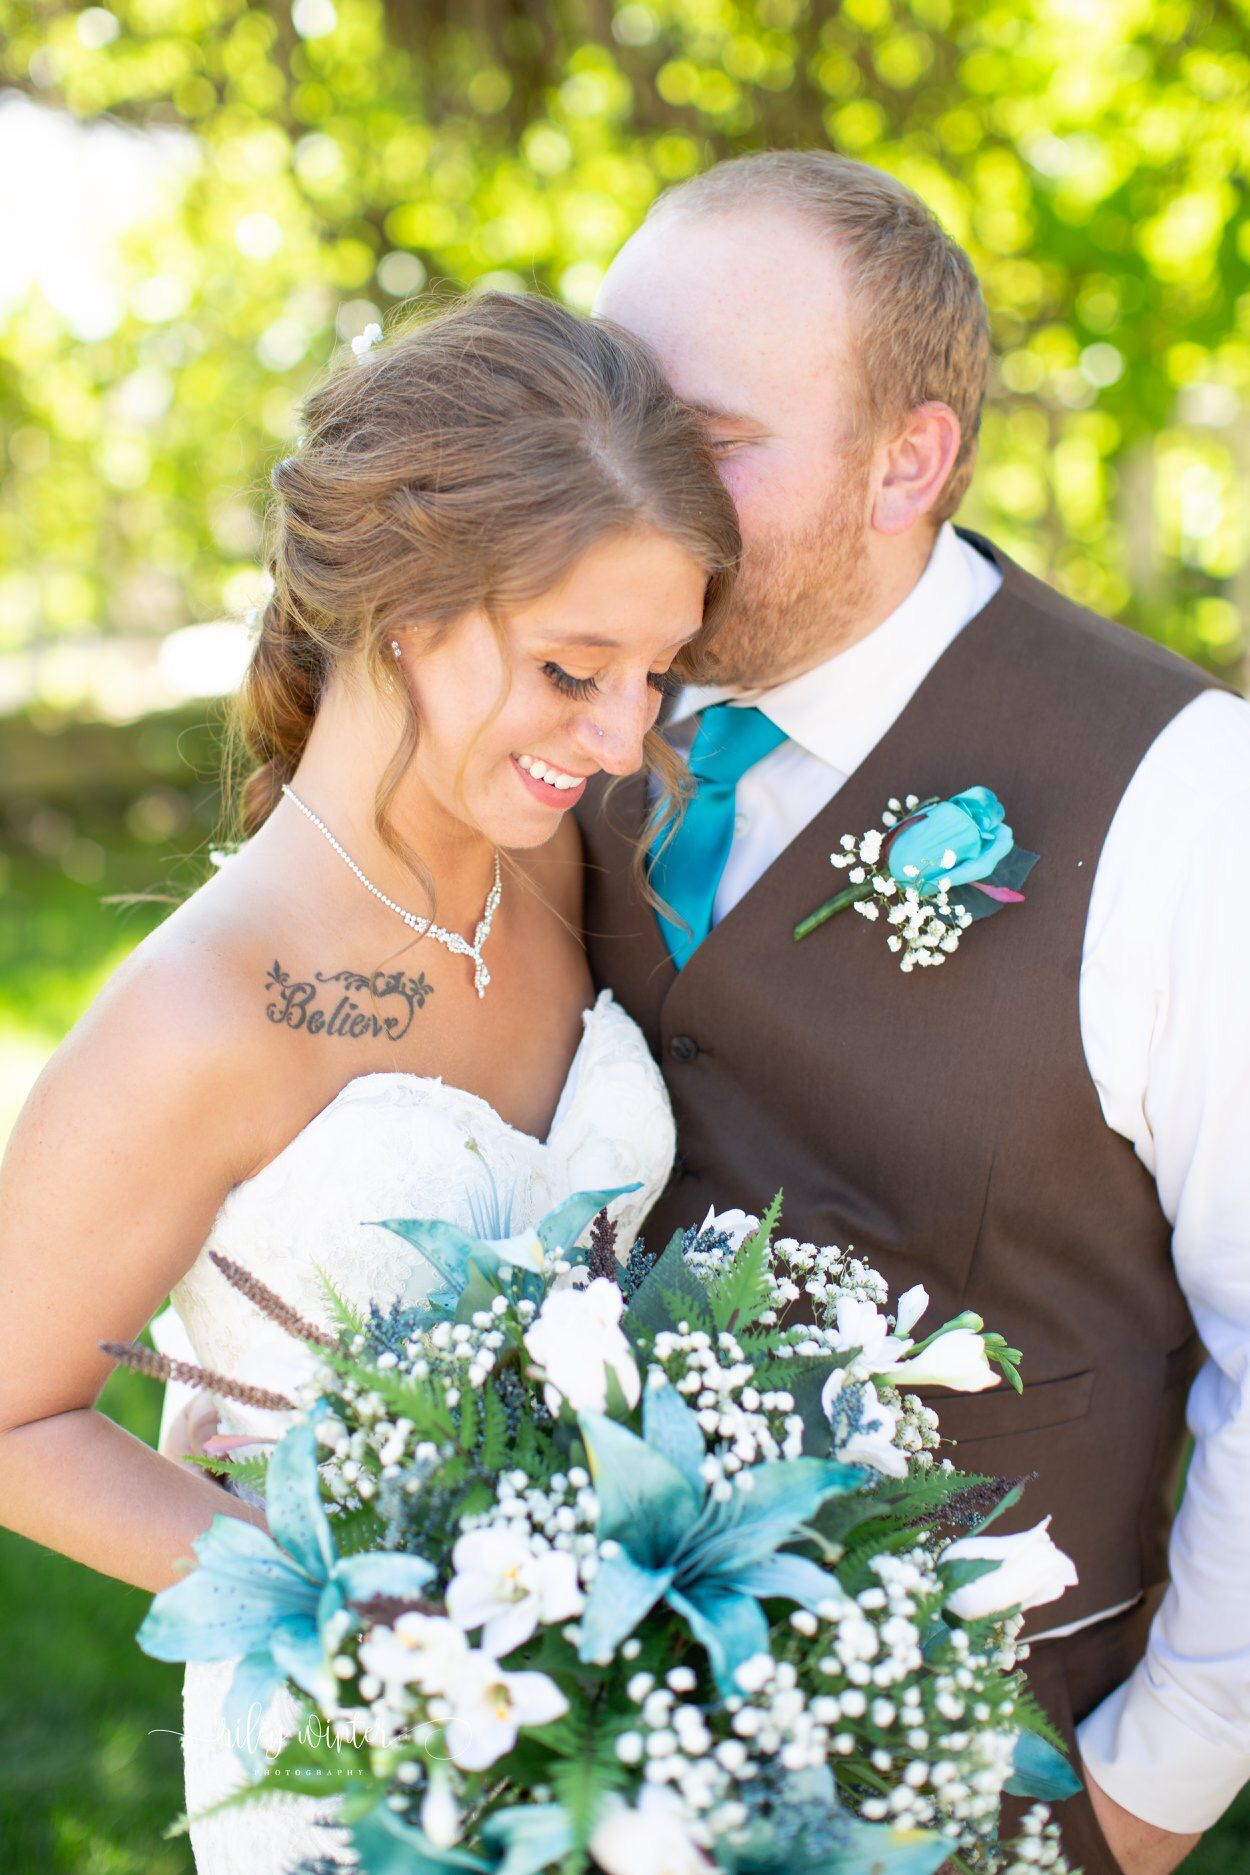 Amanda and Cody photo credit Riley Winter Photography